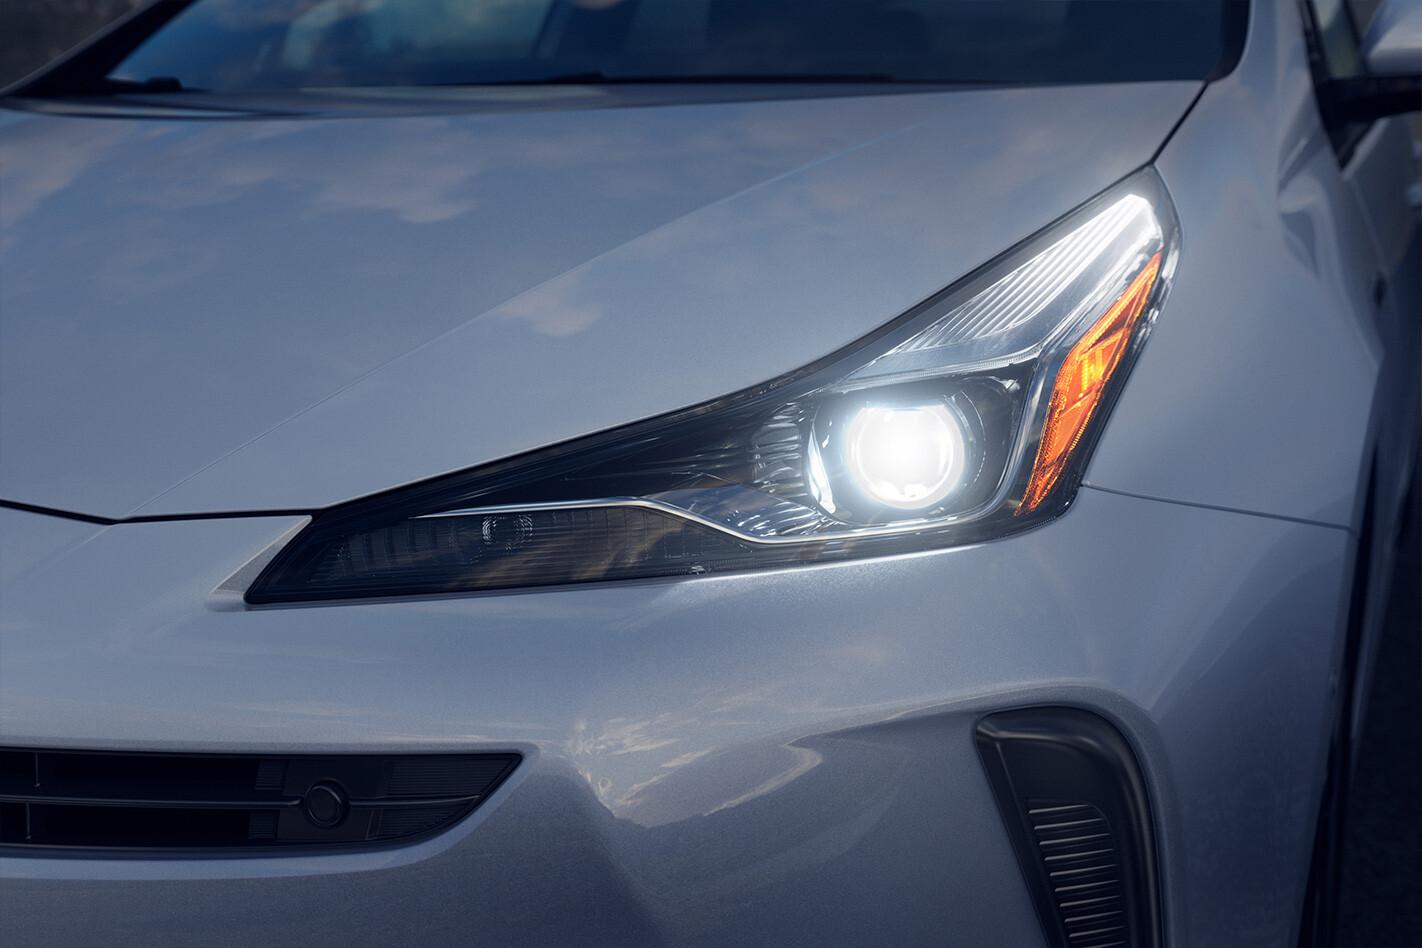 Toyota Prius Headlight Jpg